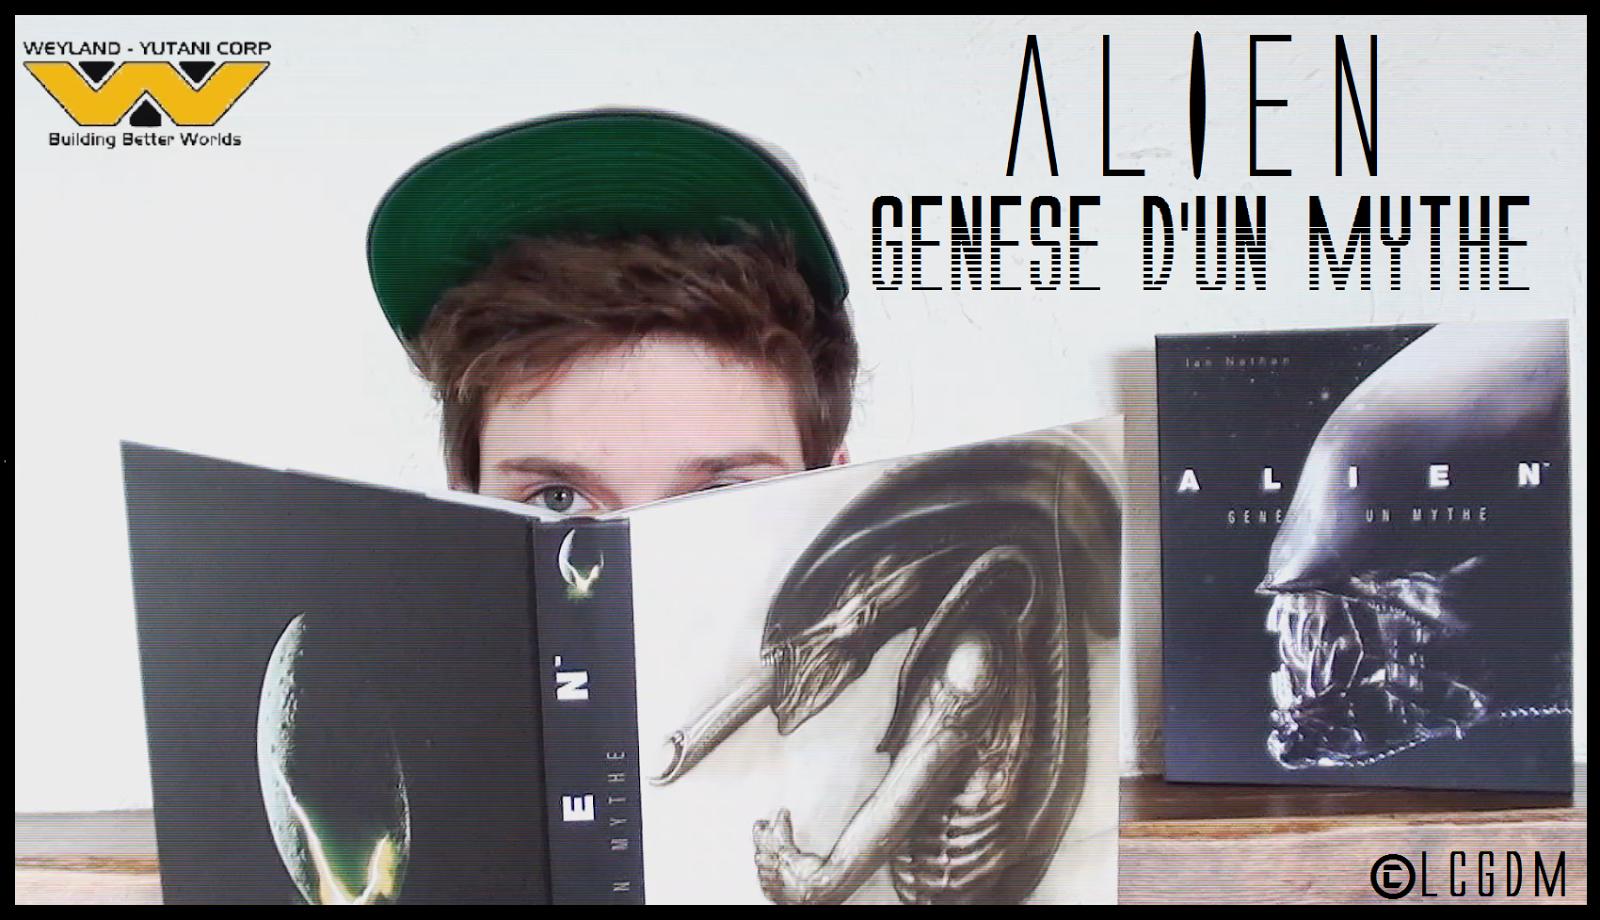 http://les-chroniques-geek.blogspot.fr/2014/04/alien-genese-dun-mythe.html